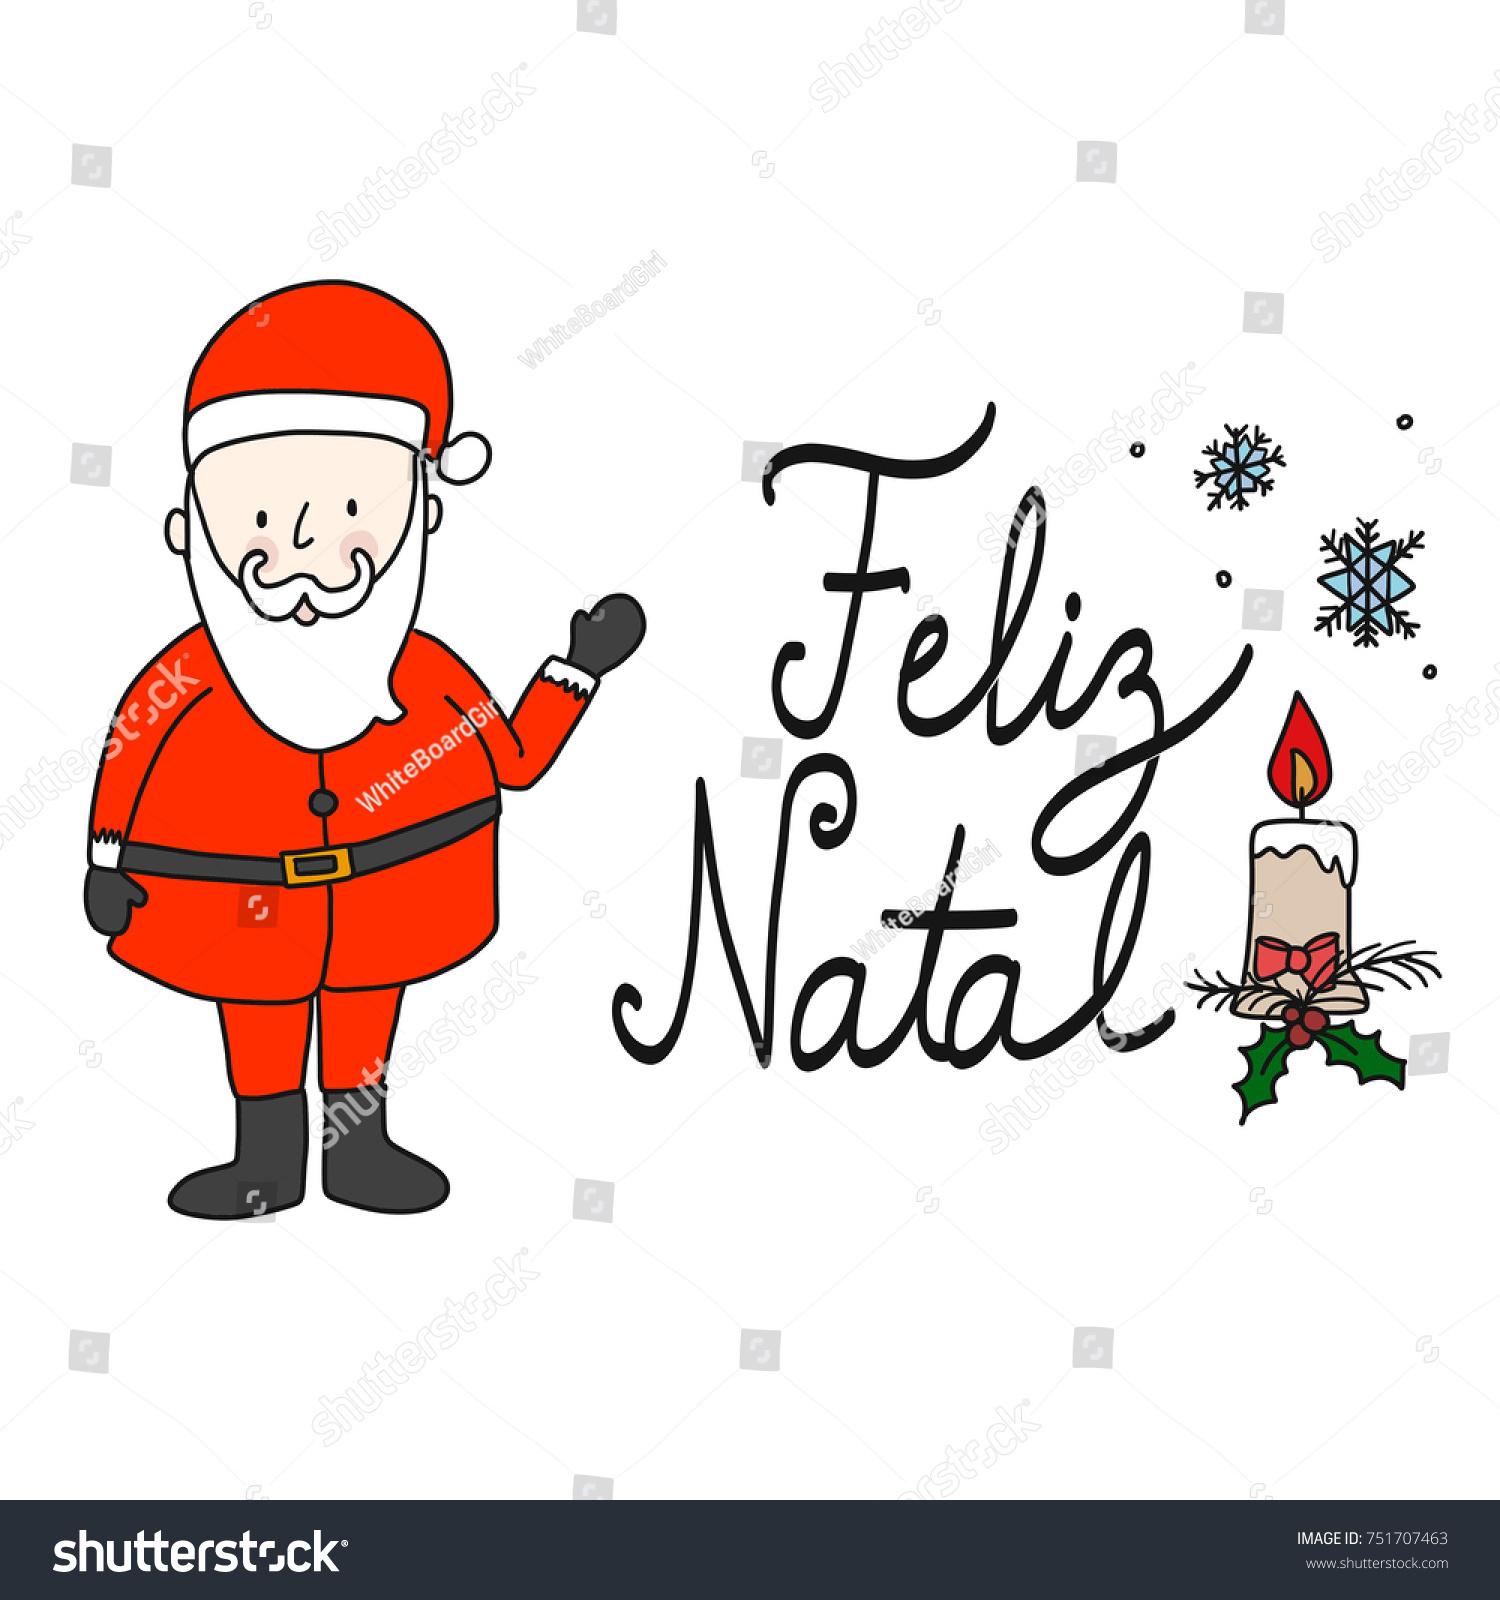 Set santa claus merry christmas portuguese stock vector royalty set santa claus and merry christmas portuguese brazil portugal vector isolate m4hsunfo